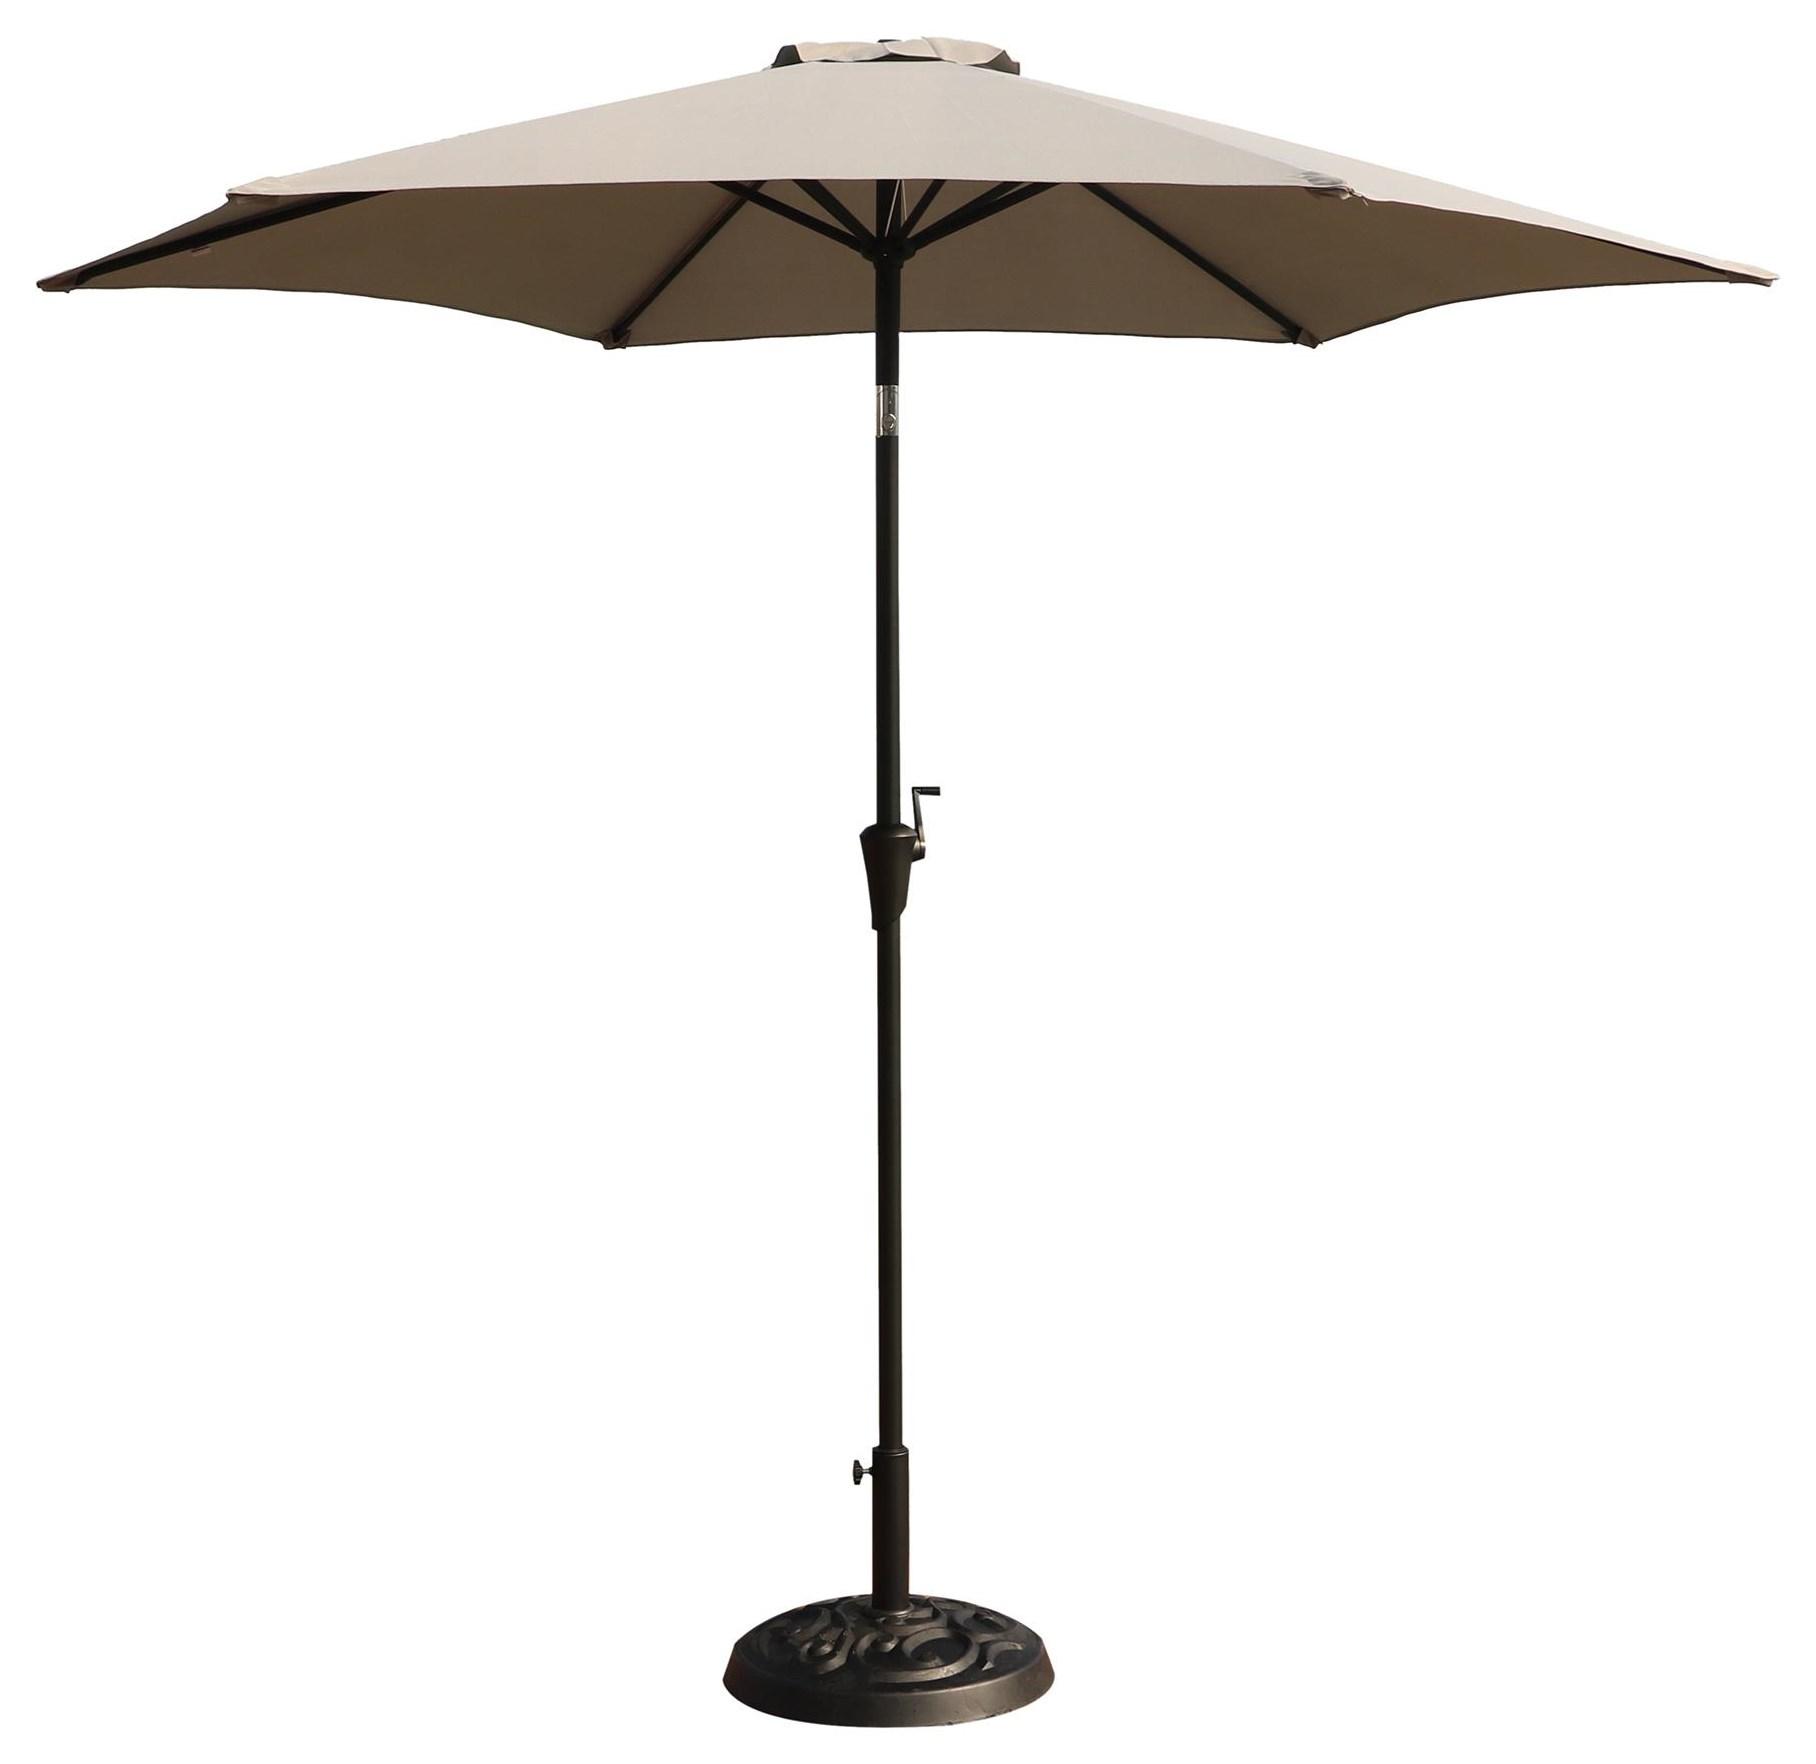 outdoor umbrellas in orland park